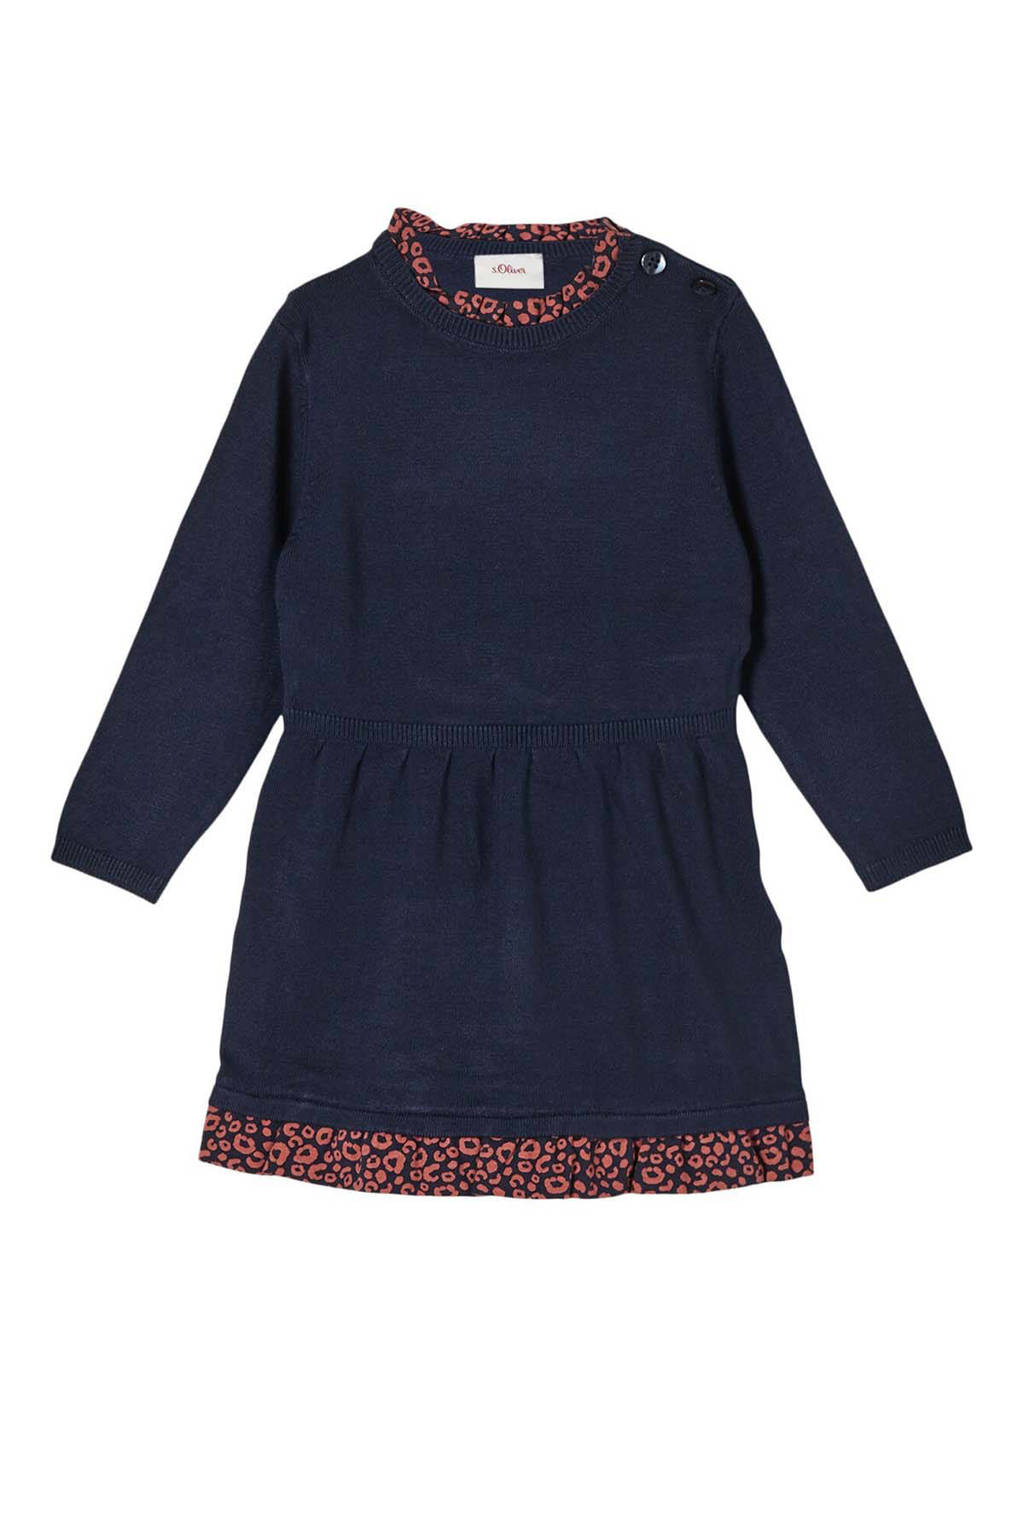 s.Oliver baby jurk met plooien donkerblauw, Donkerblauw